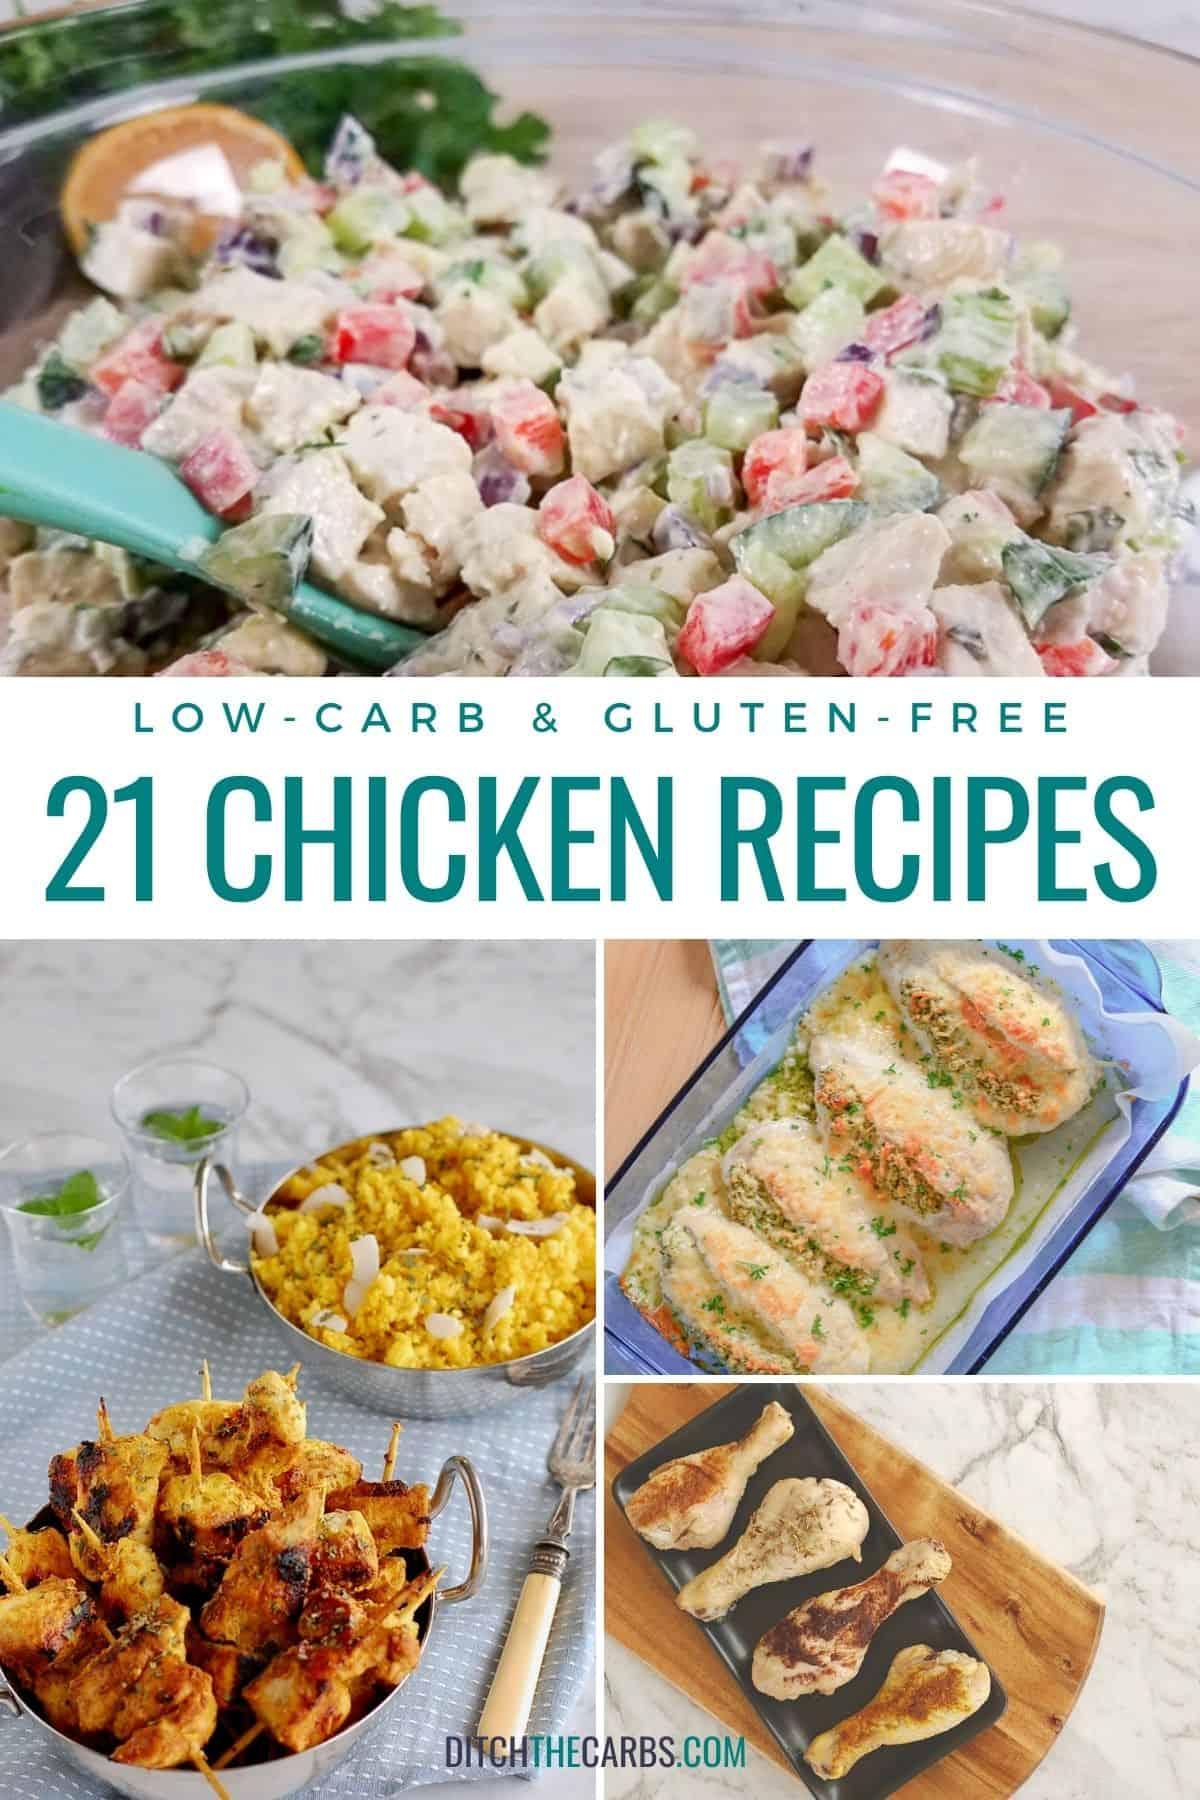 collage of chicken entrees including - chicken salad, curried chicken, pesto chicken, and fried chicken.